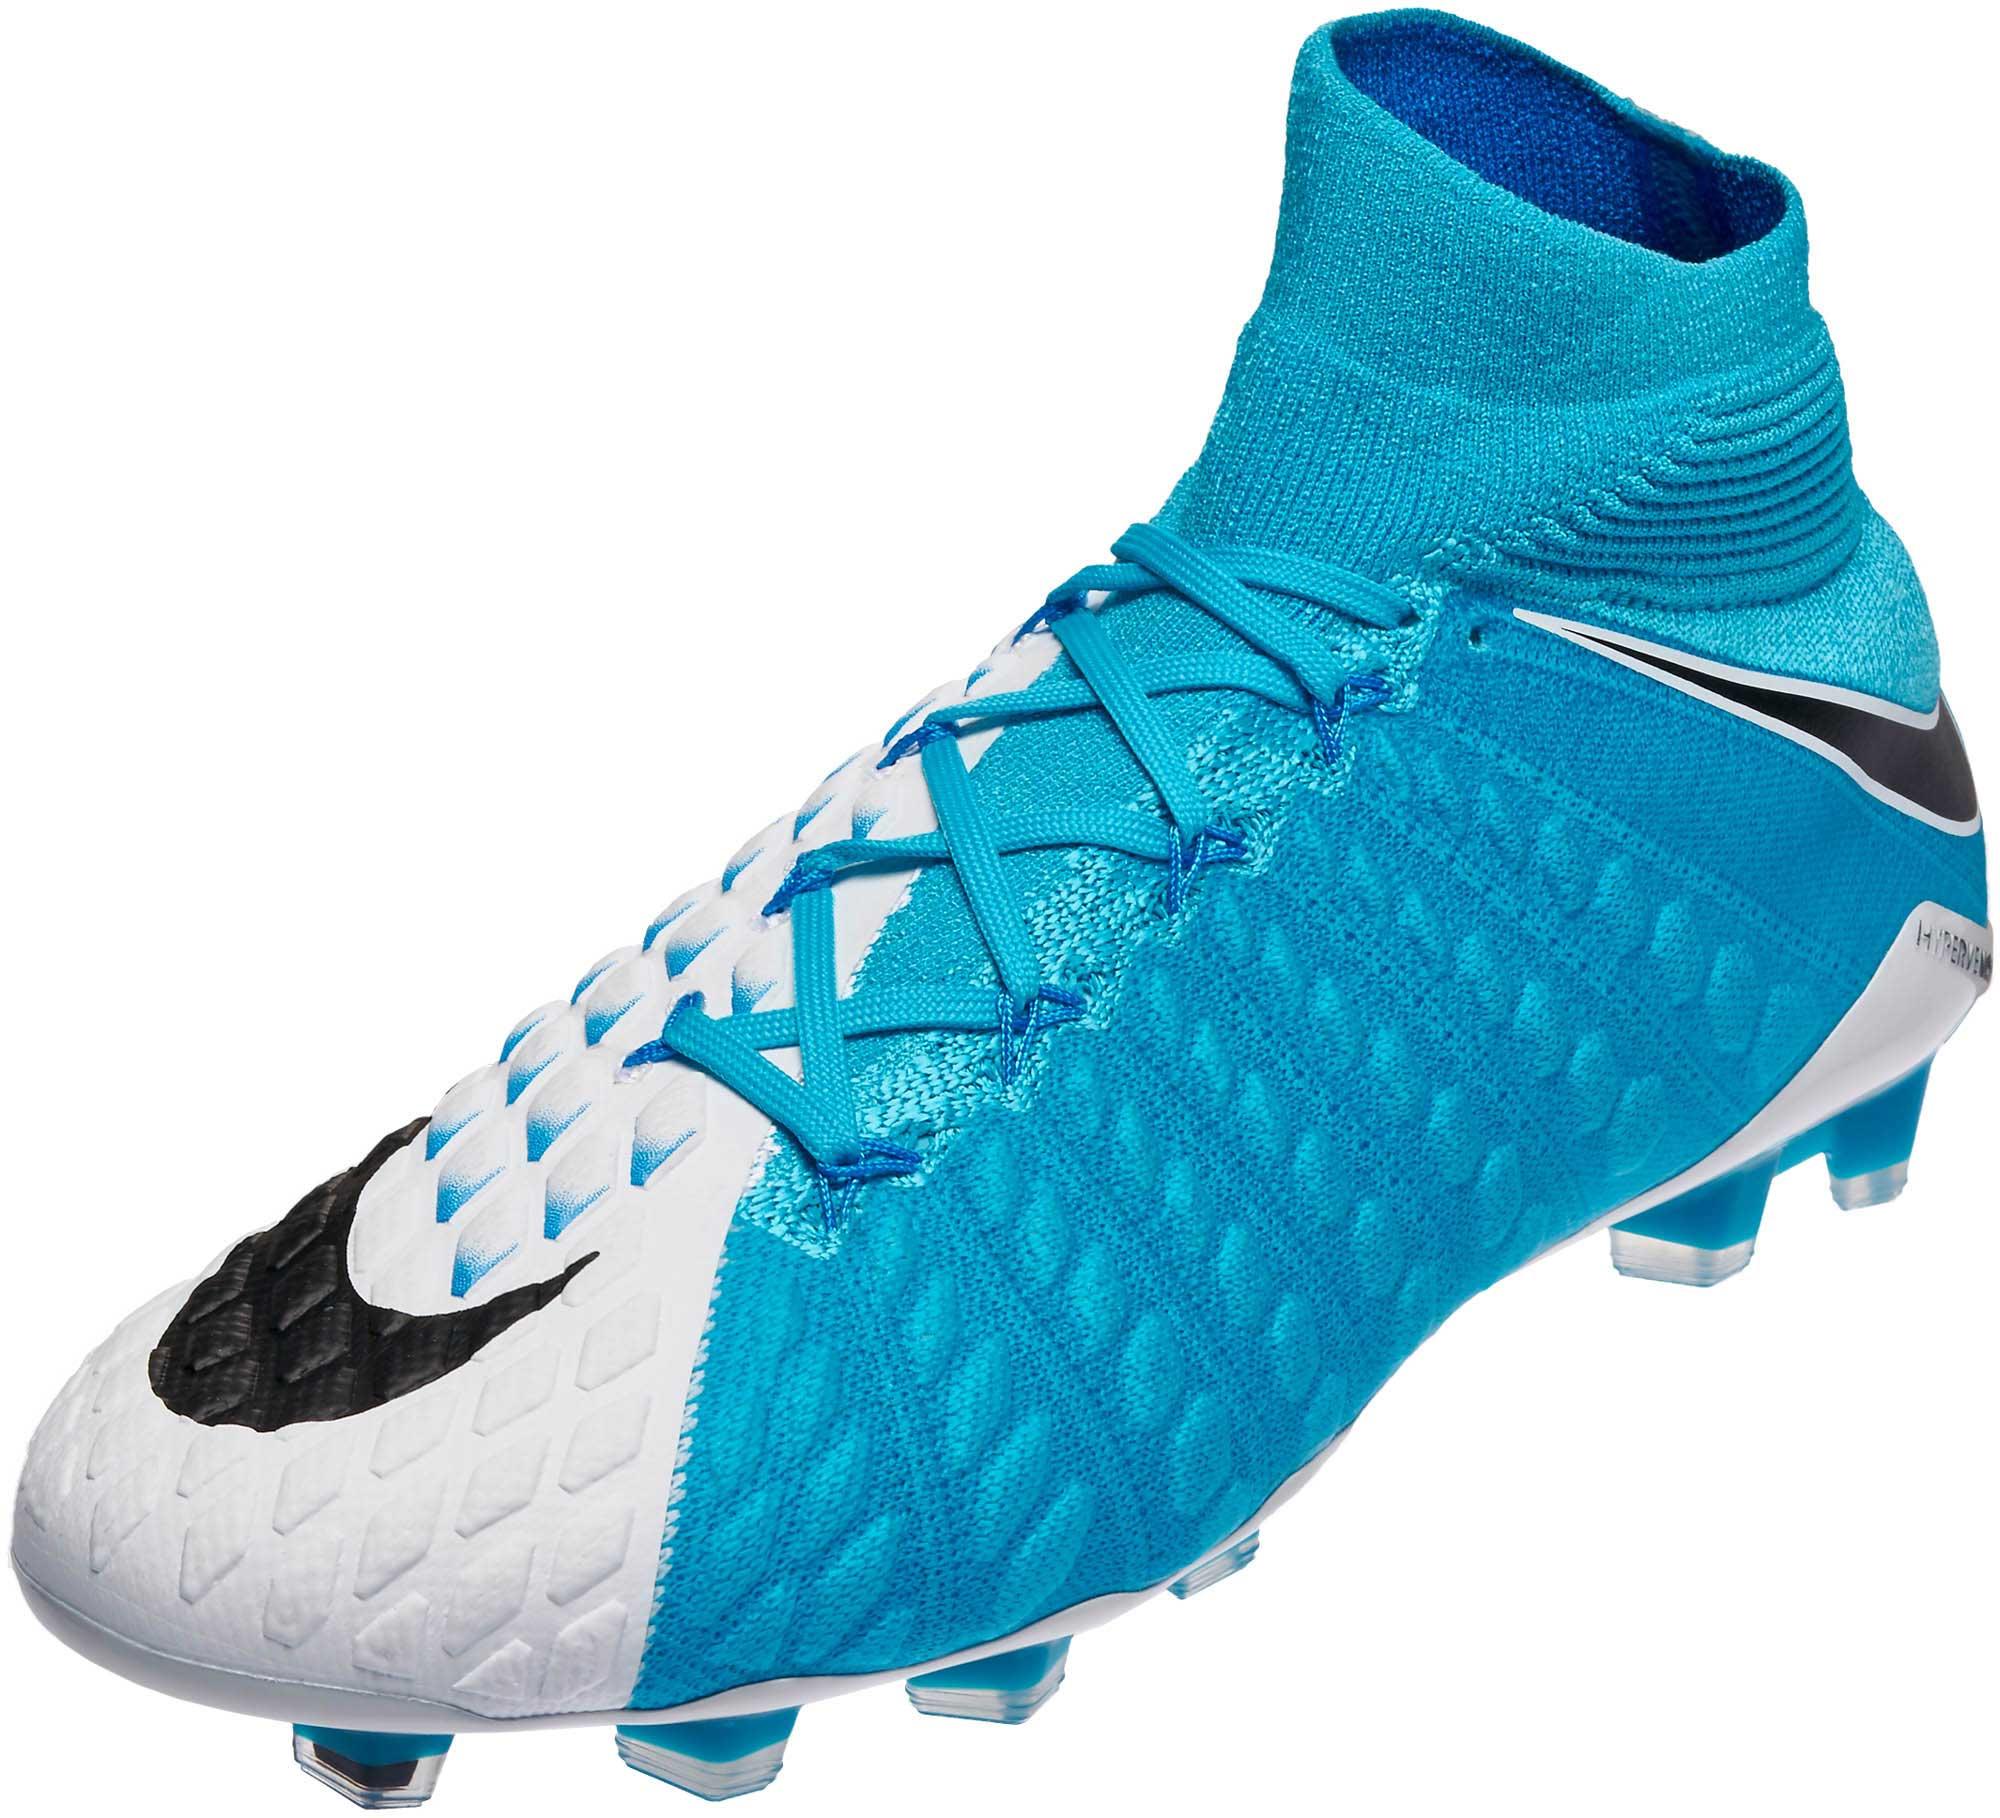 e34454869 soccer boots hypervenom on sale   OFF79% Discounts